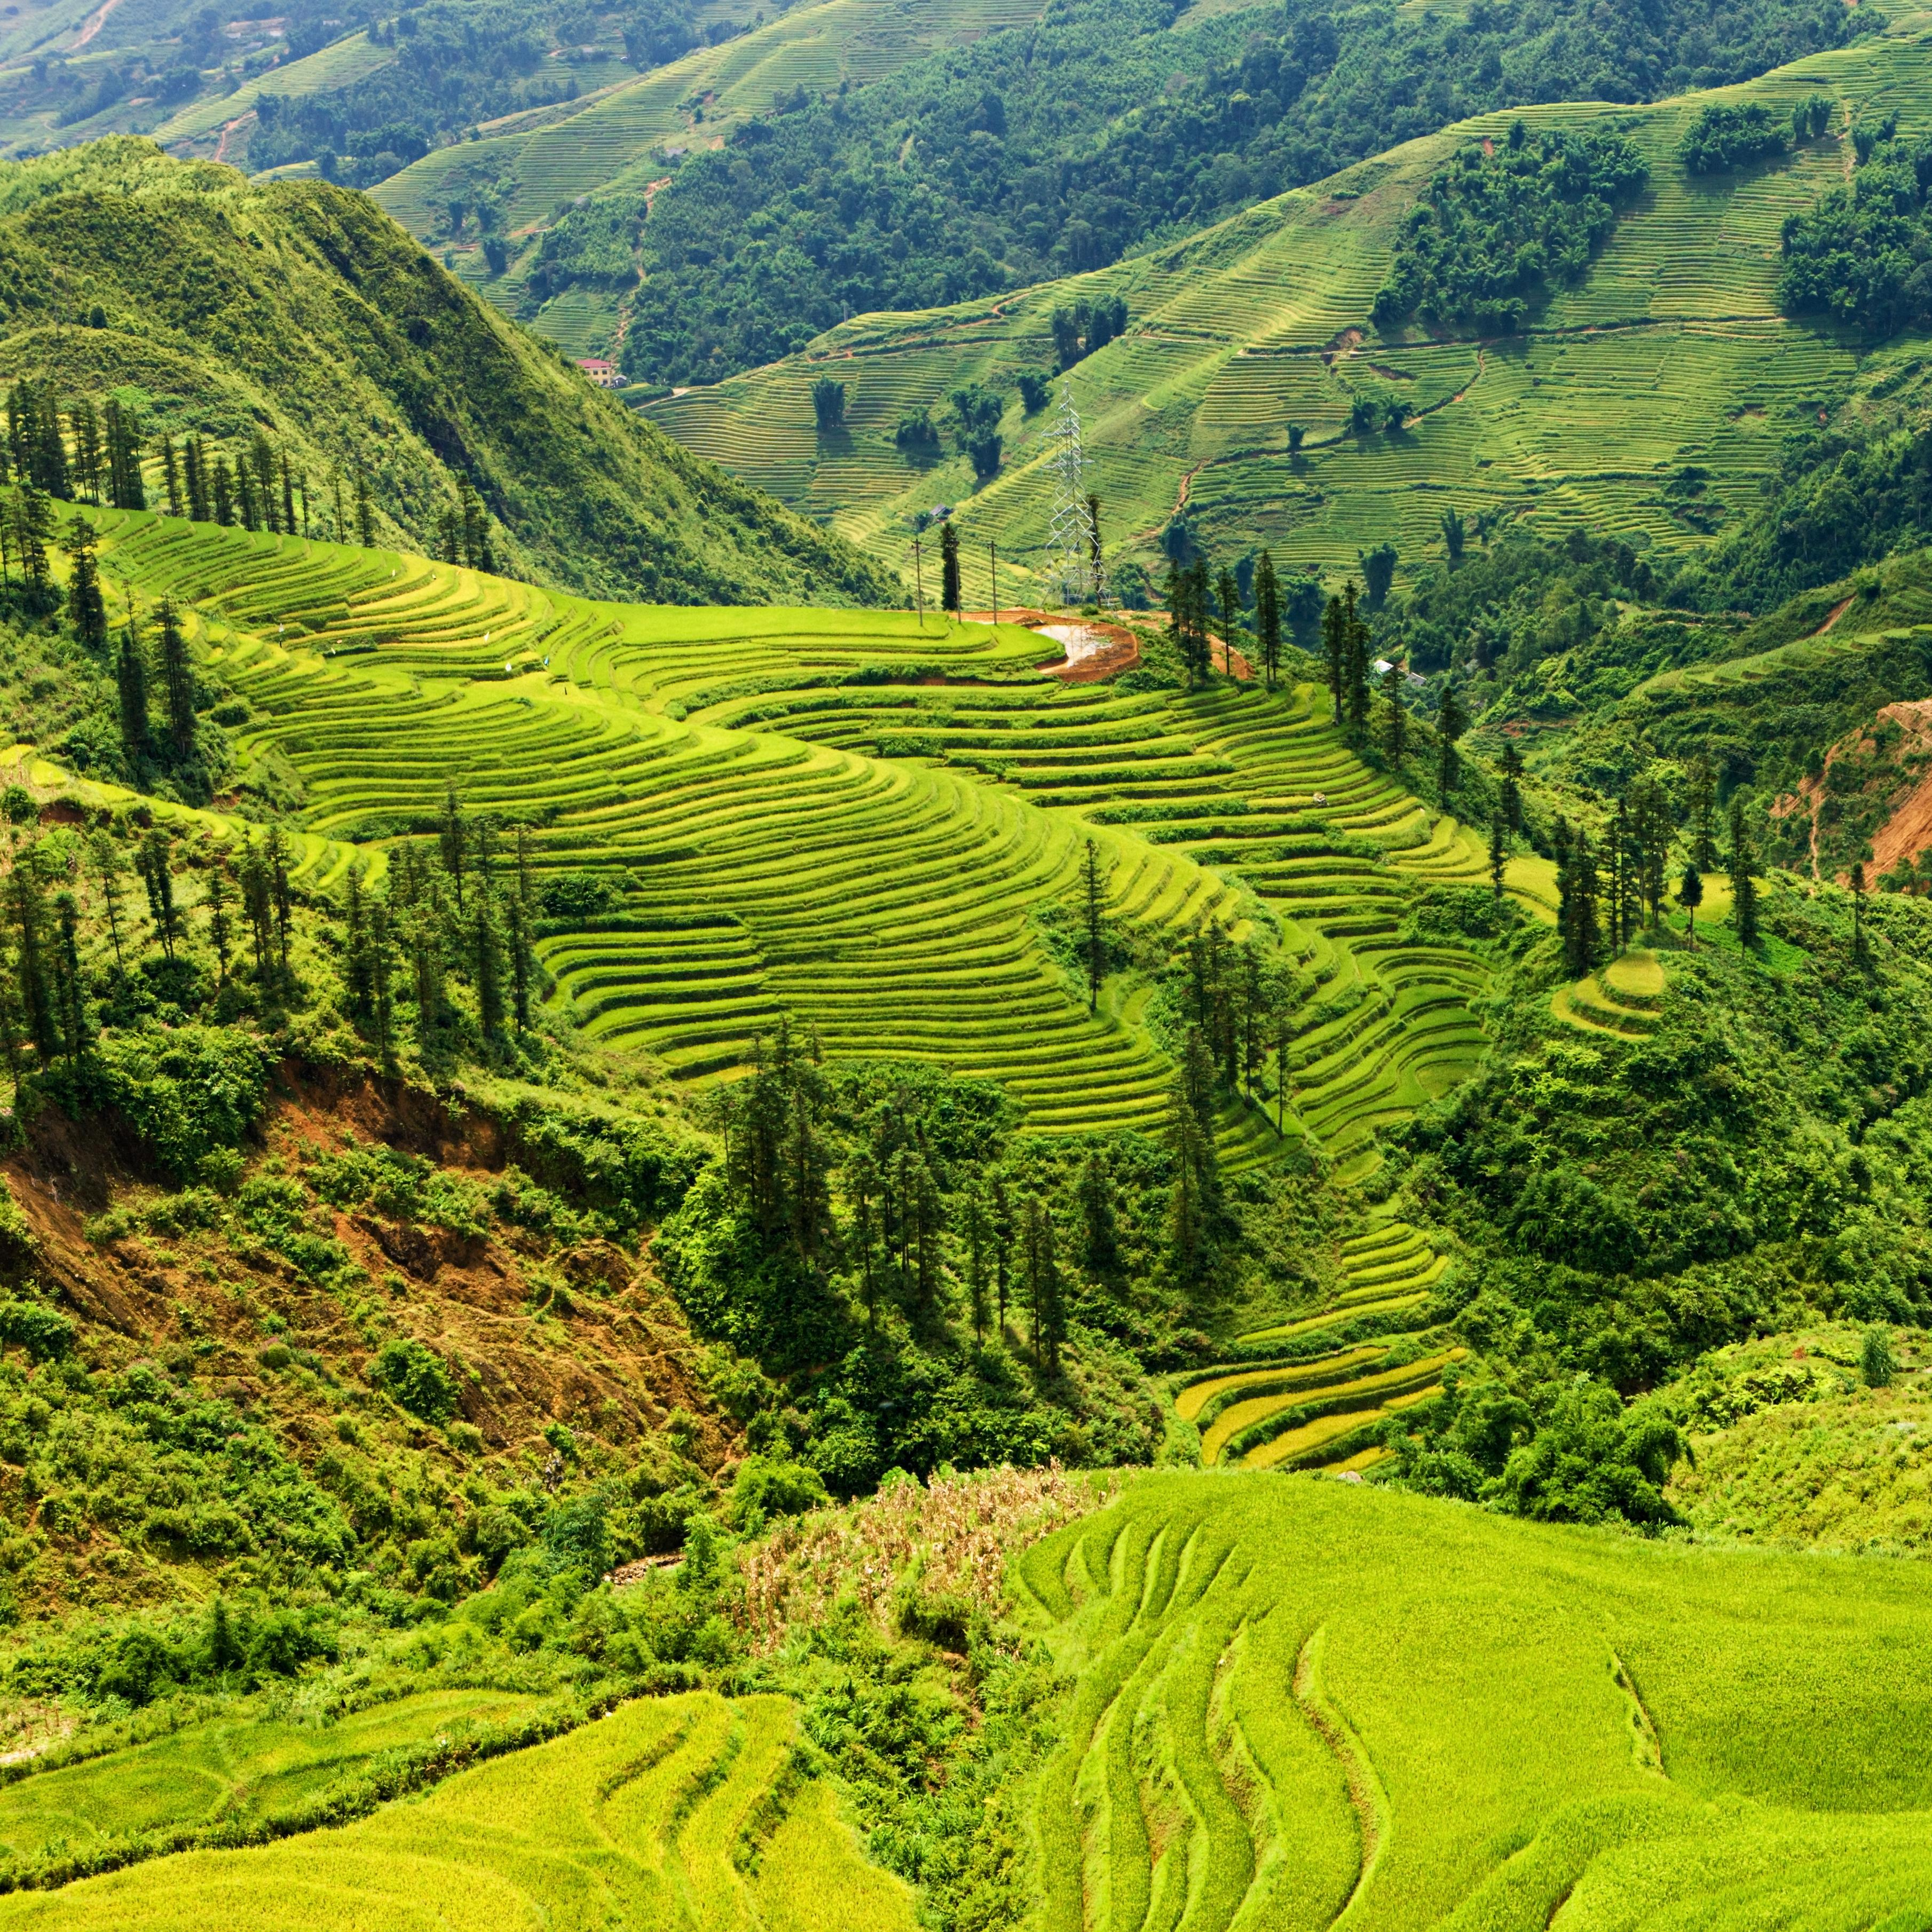 10 Best Northwest Vietnam Tours & Vacation Packages 2020